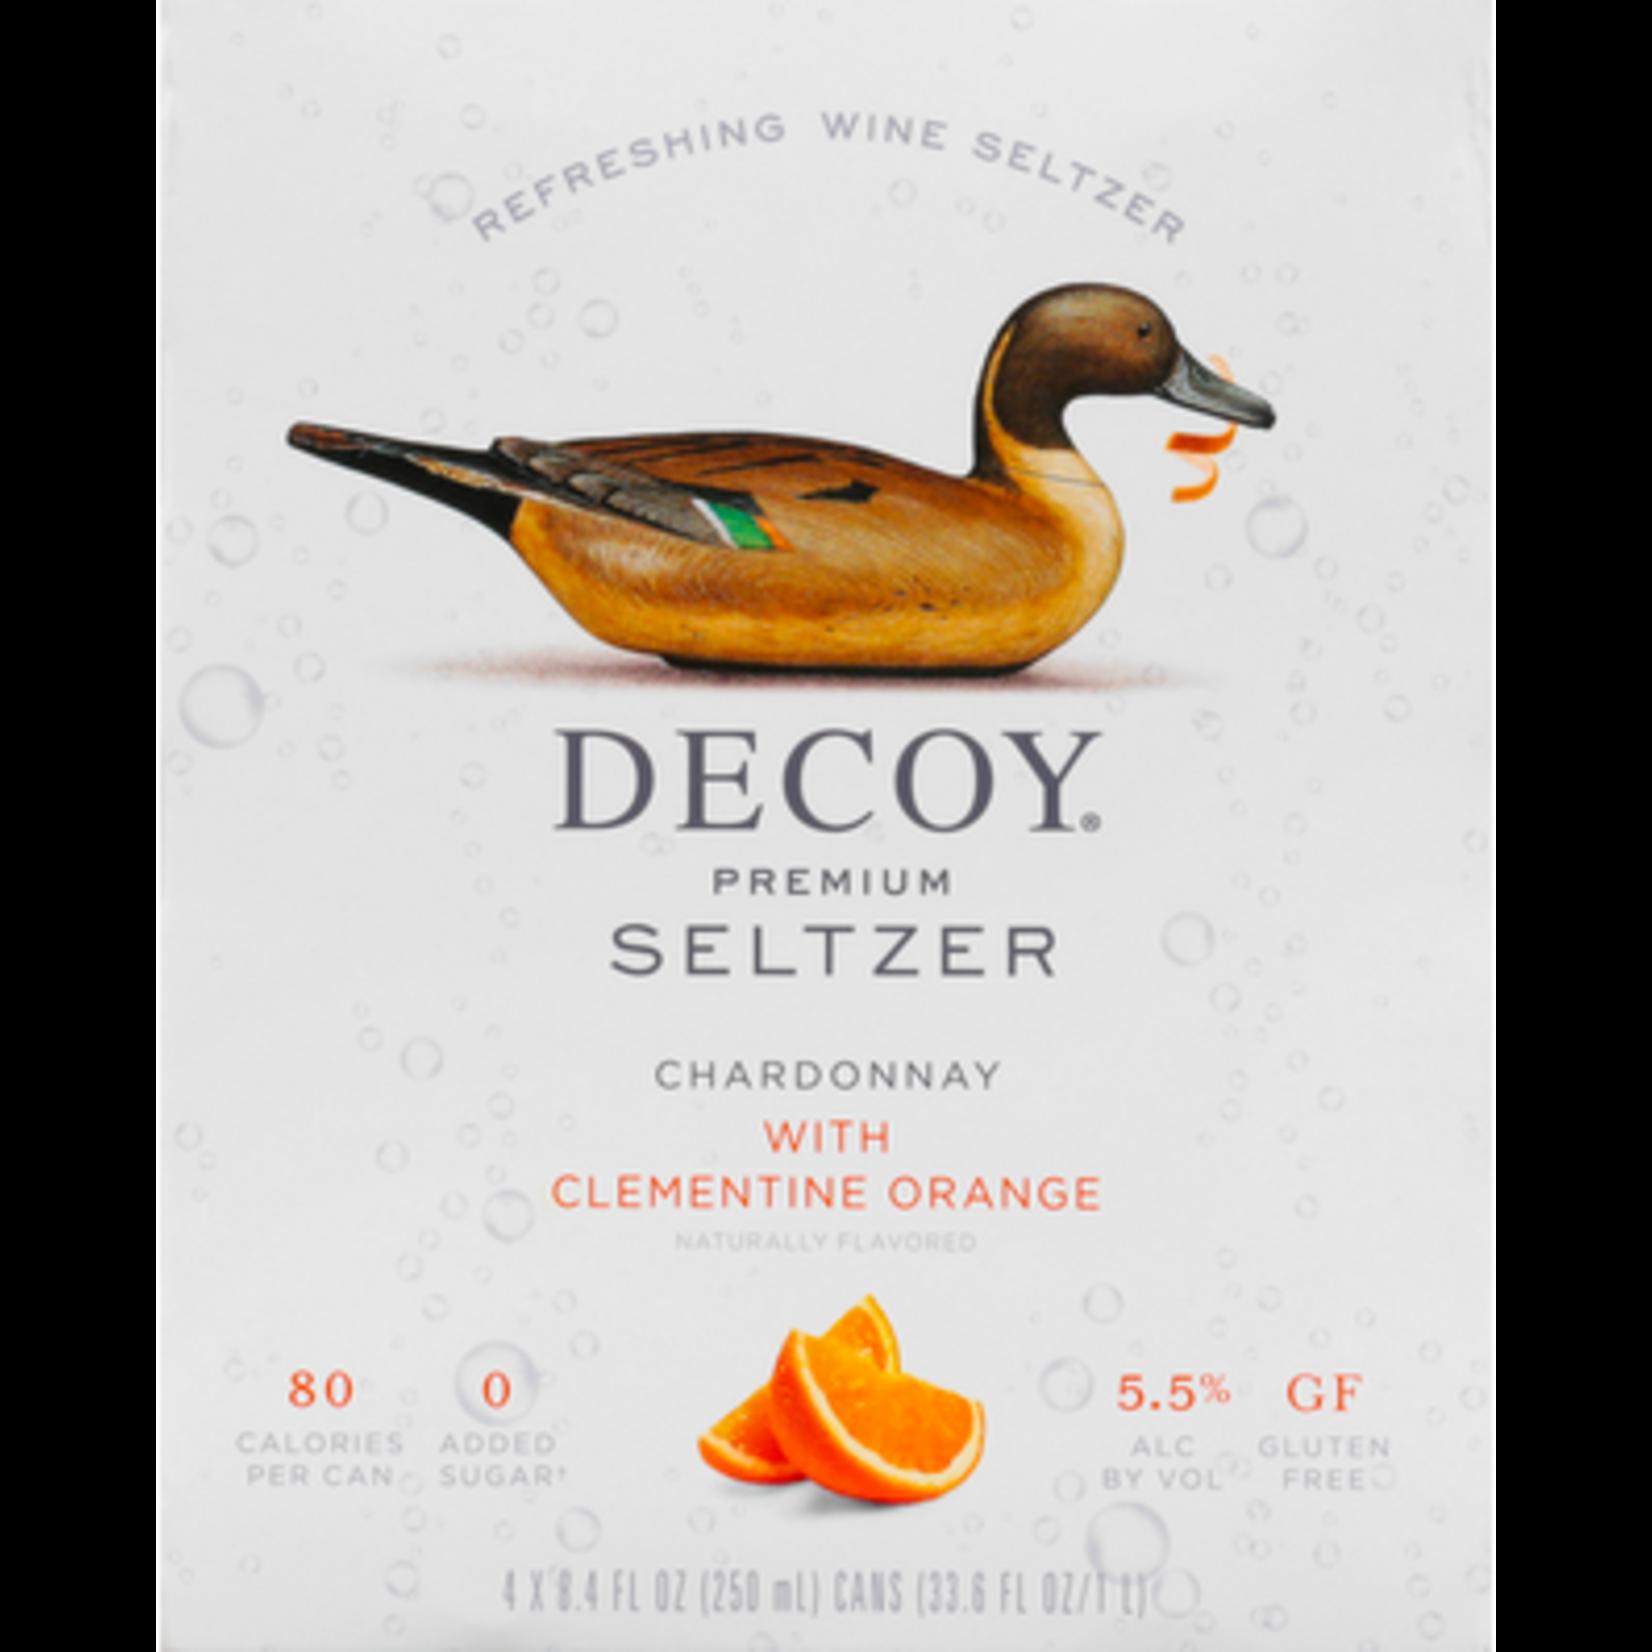 Decoy Primium Seltzer Decoy Wine Seltzer Chardonnay with Clementine Orange 4 Pack Cans  250ml  California